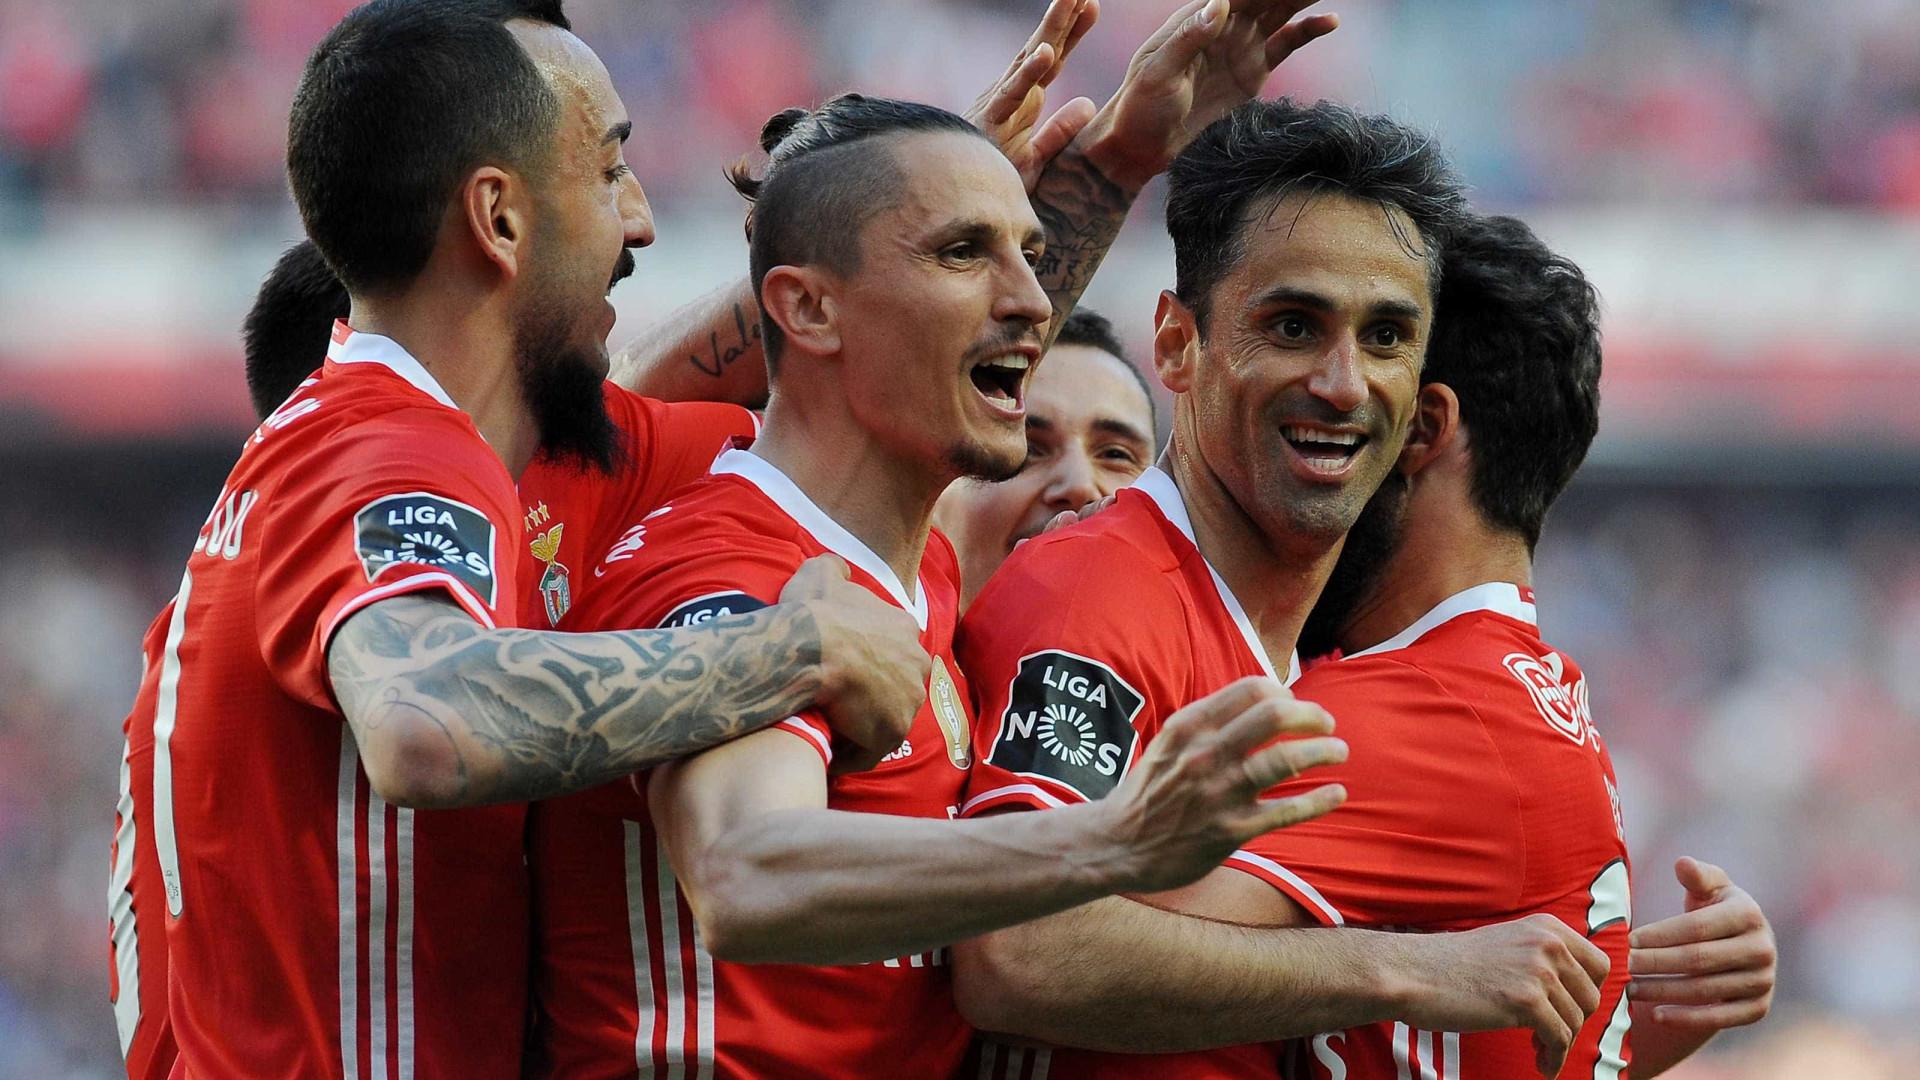 Jonas ultrapassa Magnusson como segundo melhor marcador estrangeiro do Benfica